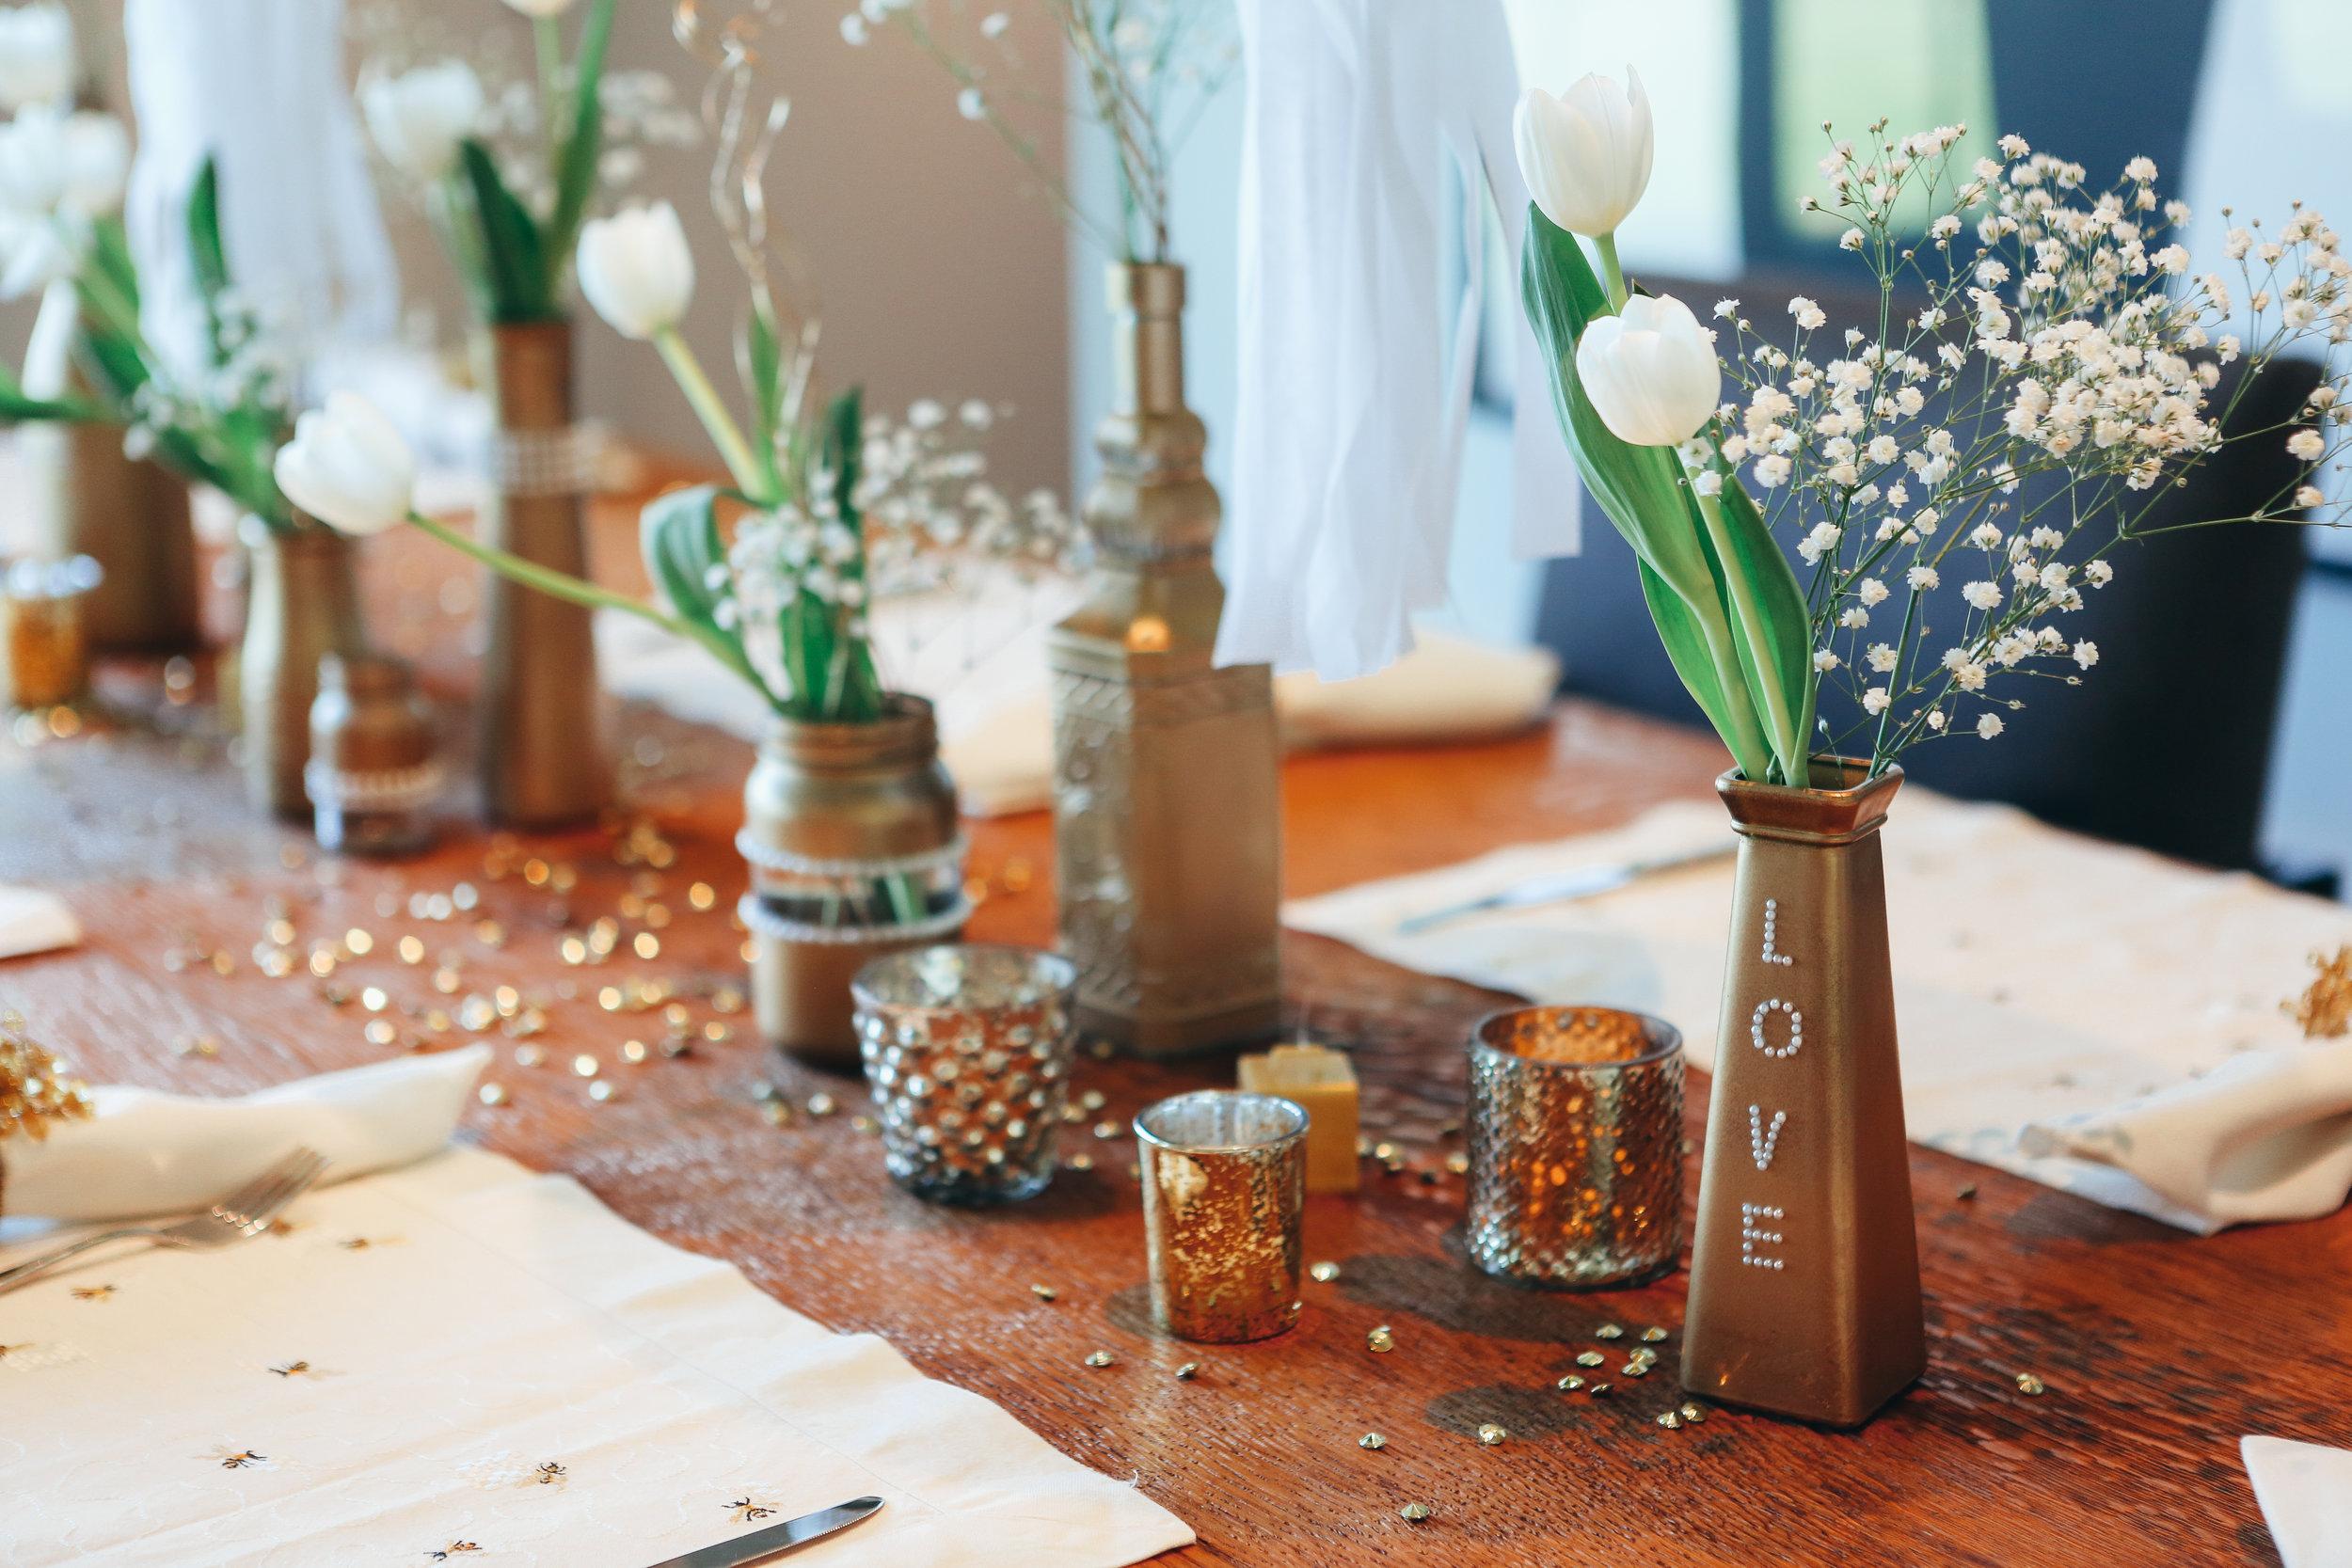 bridal shower vases and decor